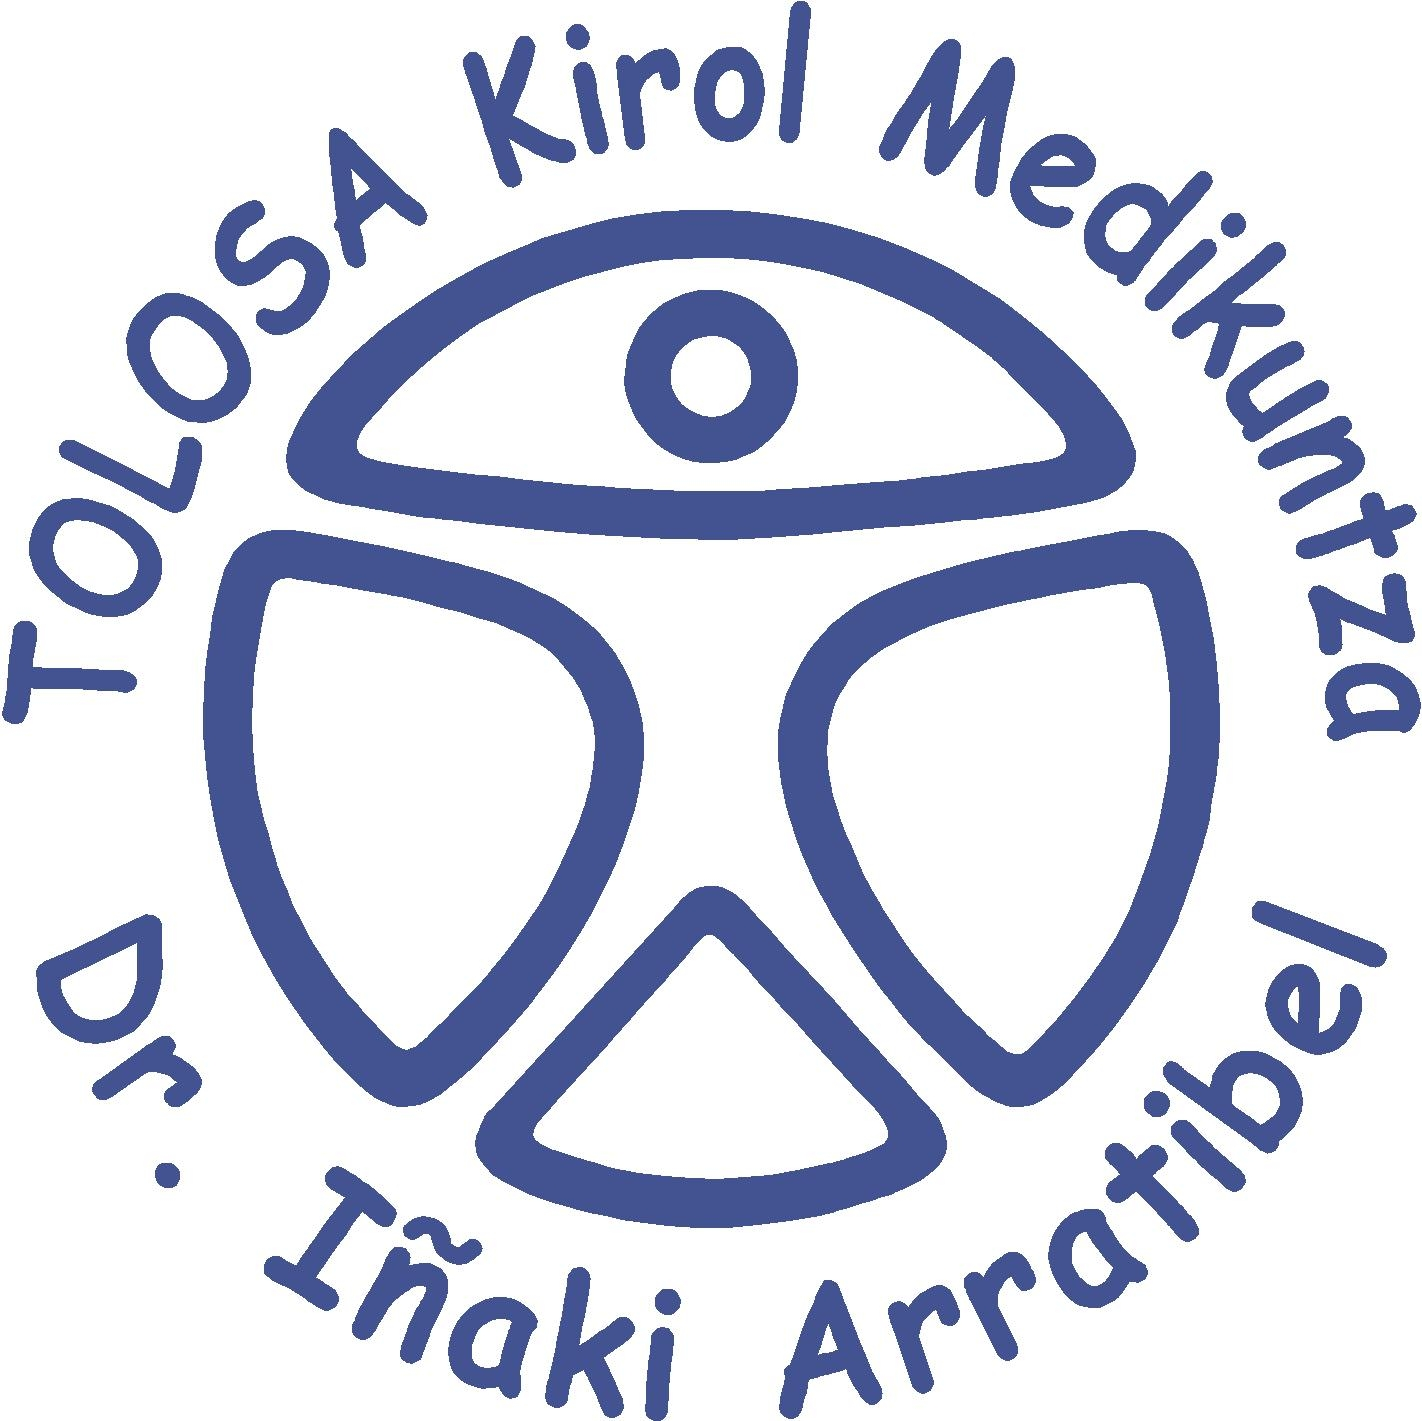 Tolosa Kirol Medikuntza